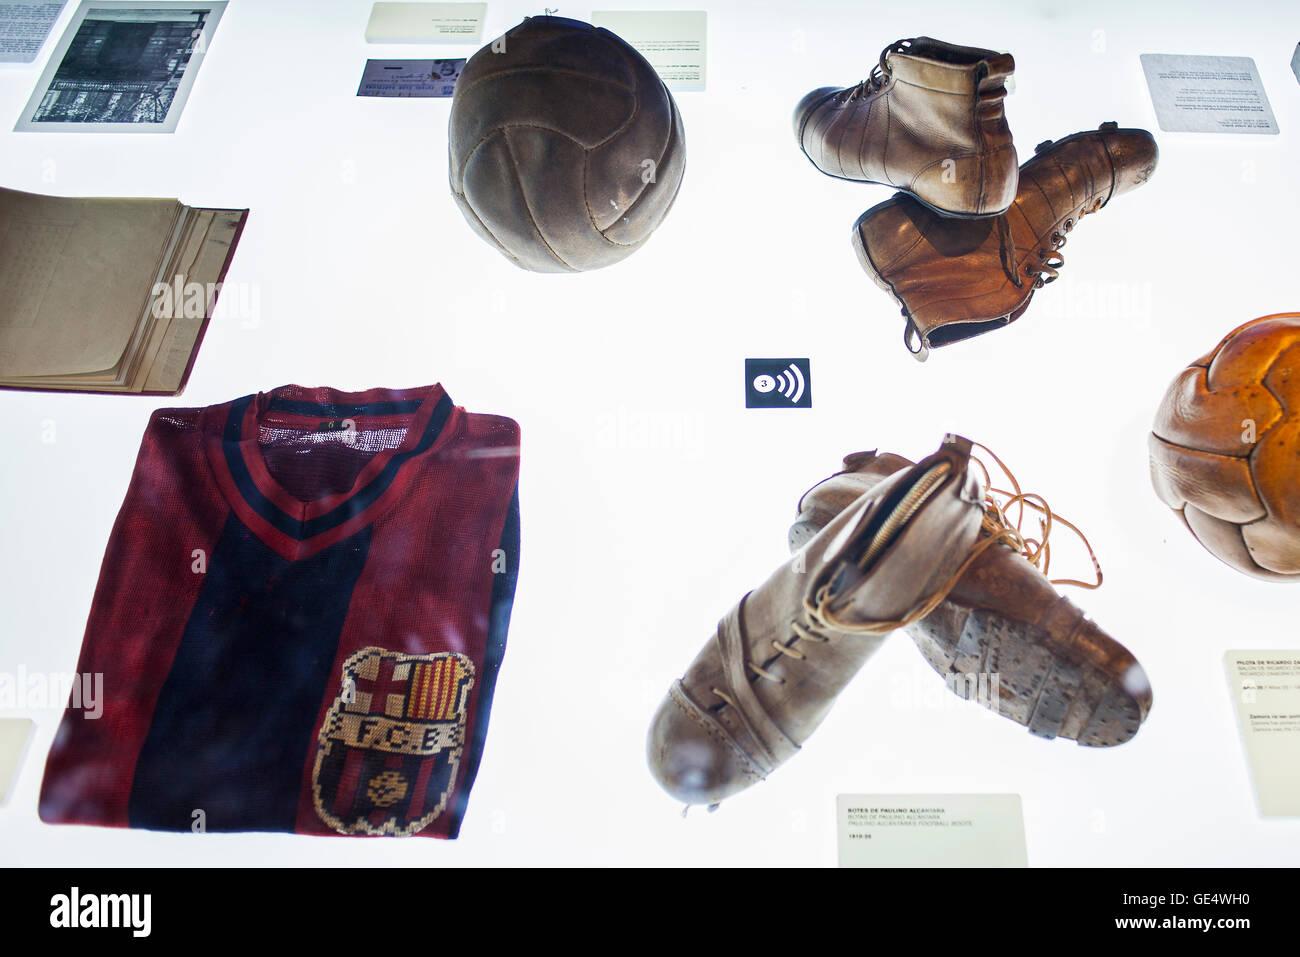 Museu FC Barcelona, FC Barcelona Museum, Nou Camp, Barcelona, Catalonia, Spain. - Stock Image